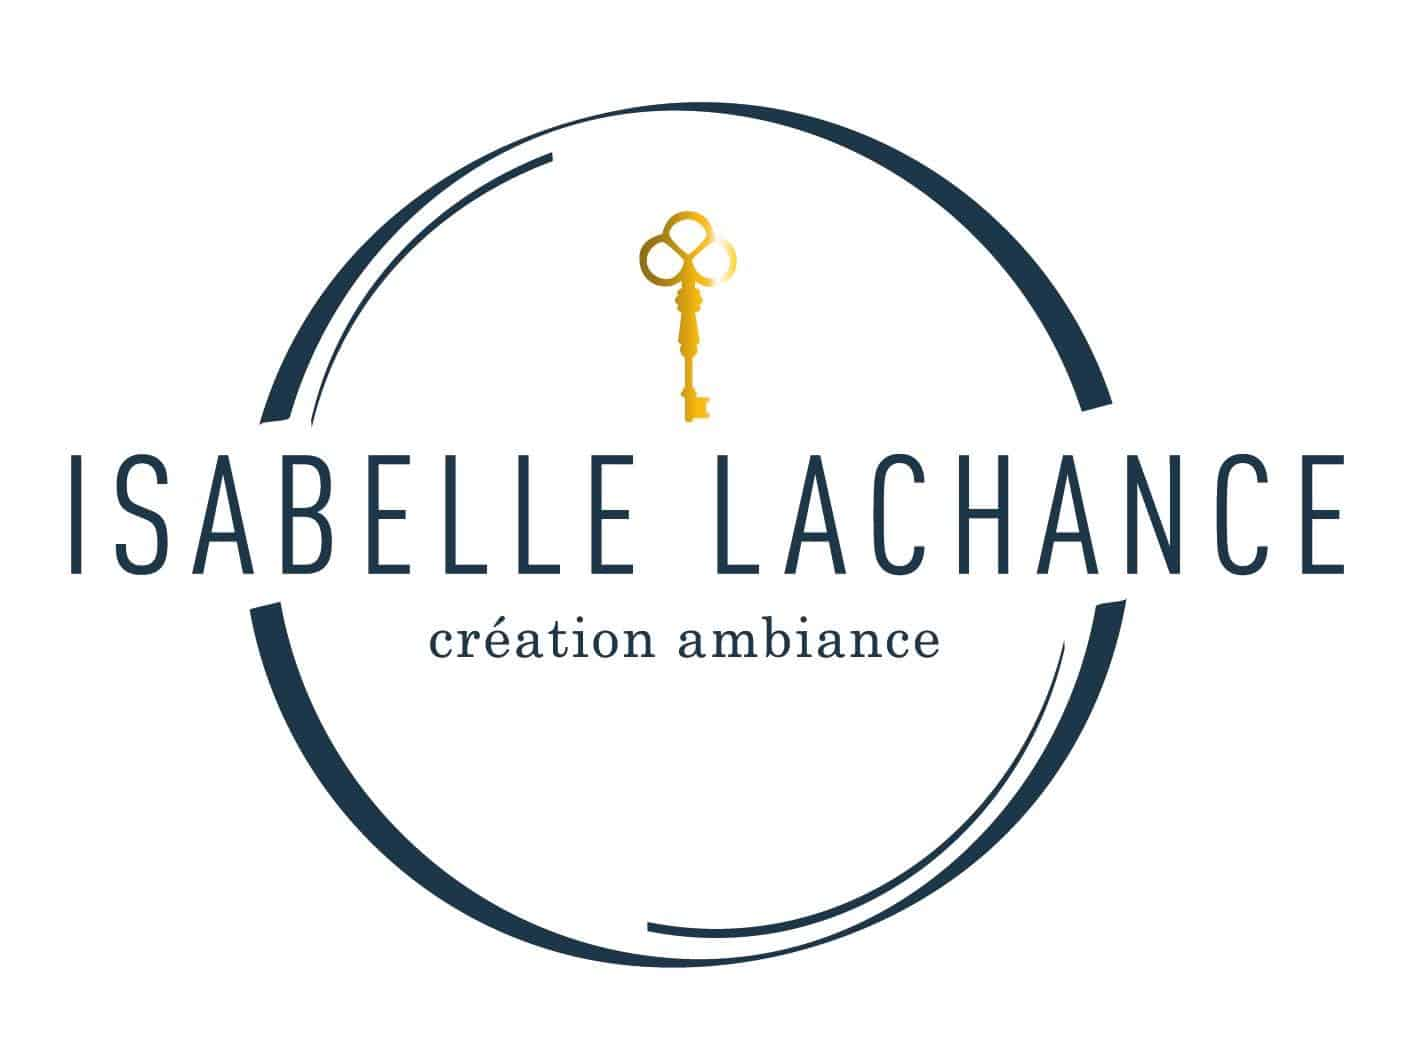 Isabelle Lachance